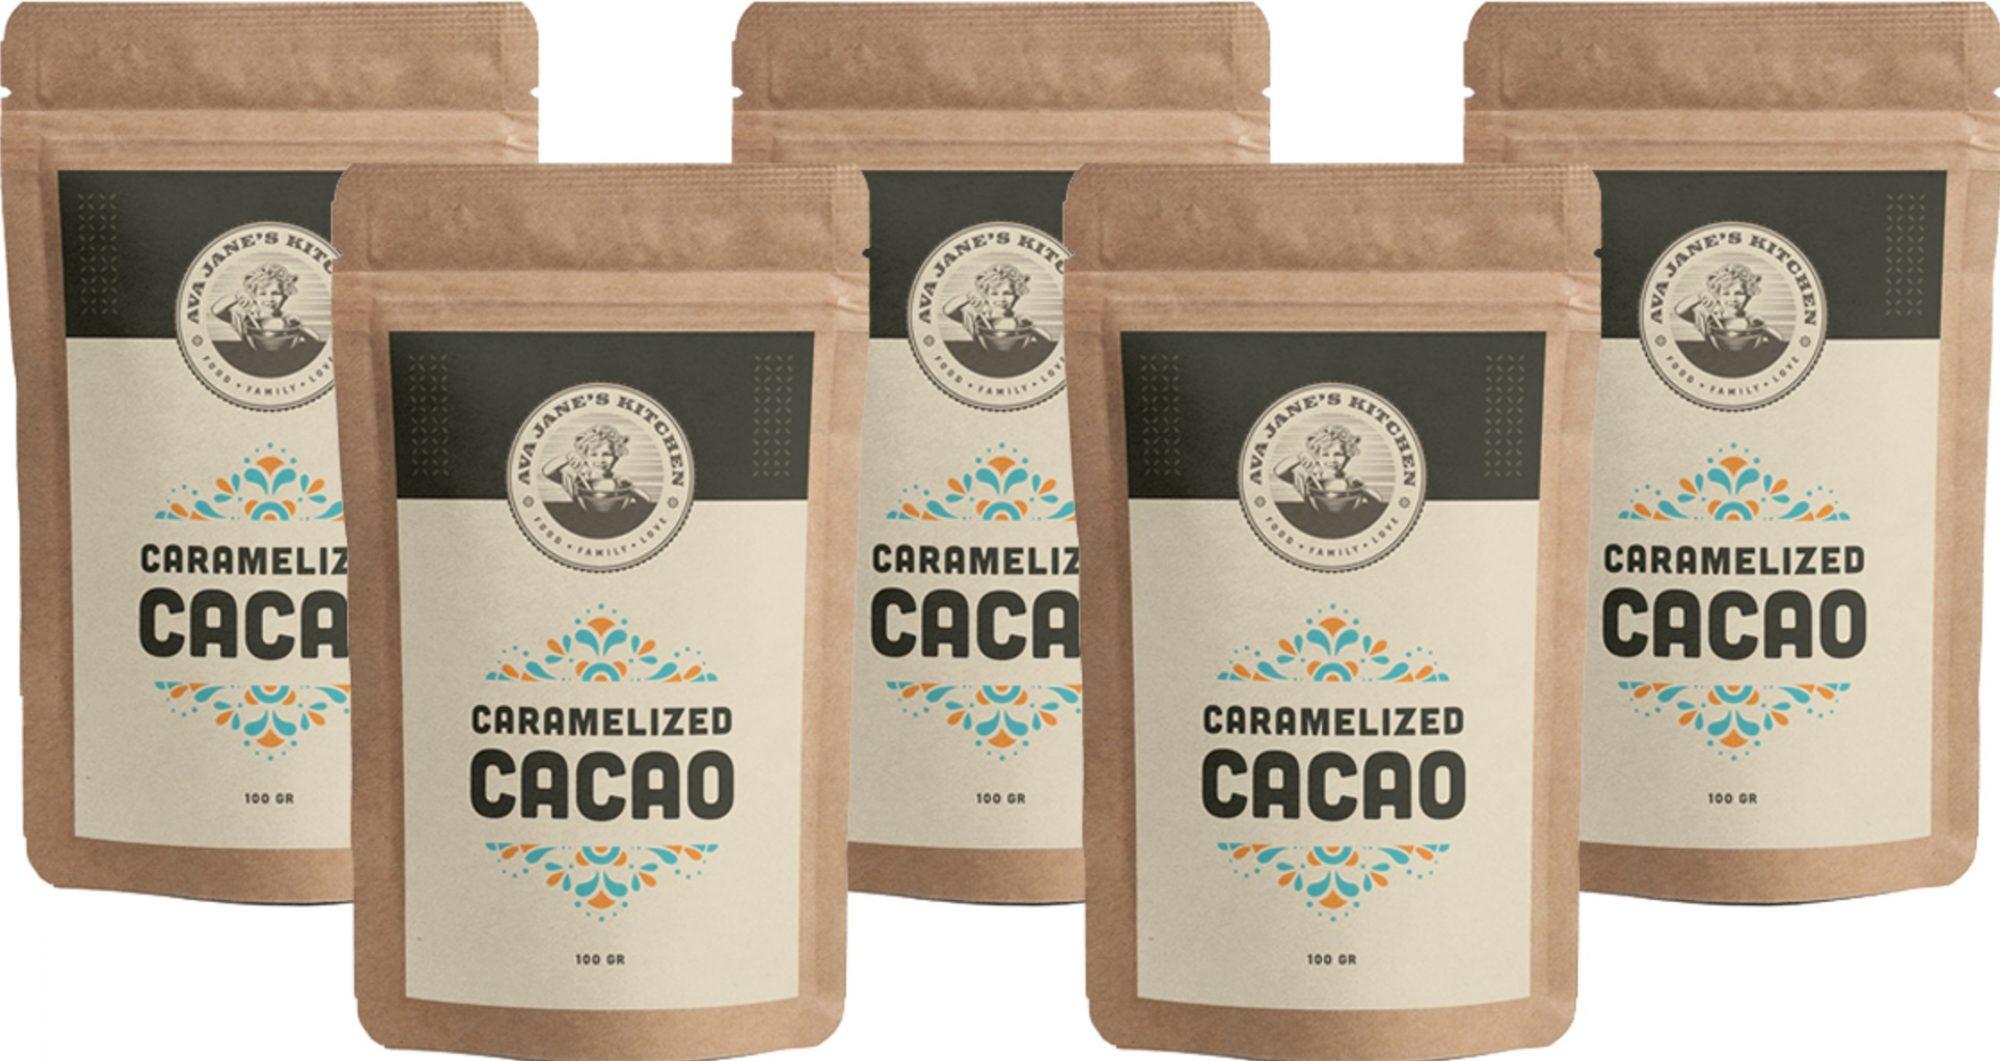 caramelized-cacao-beans.jpg